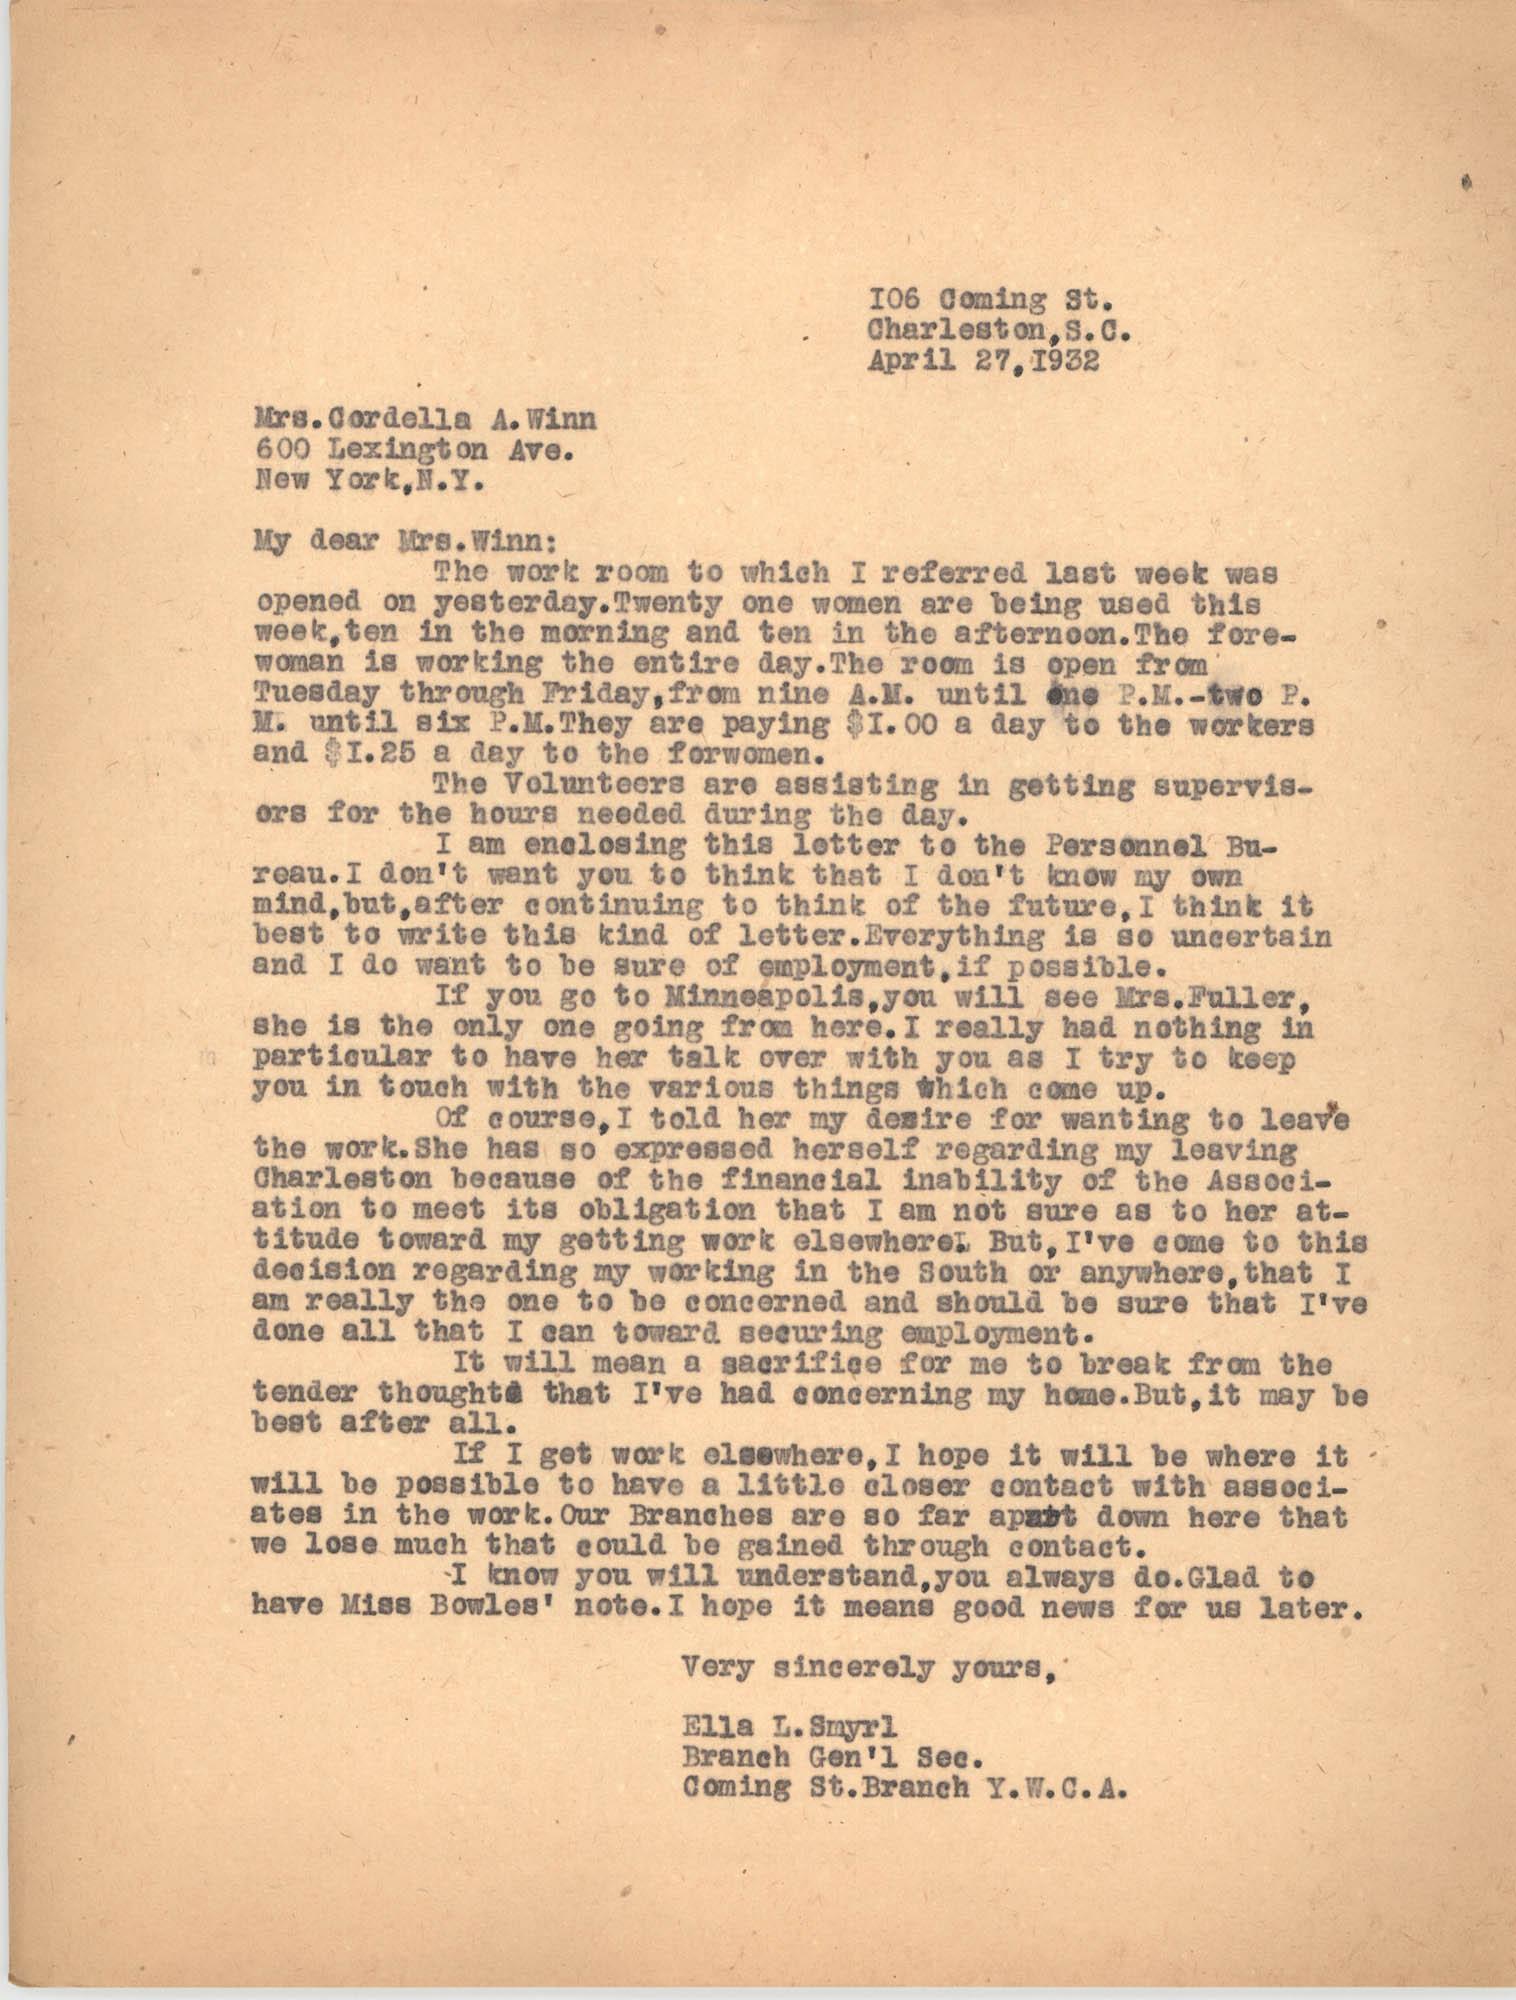 Letter from Ella L. Smyrl to Cordella A. Winn, April 27, 1932